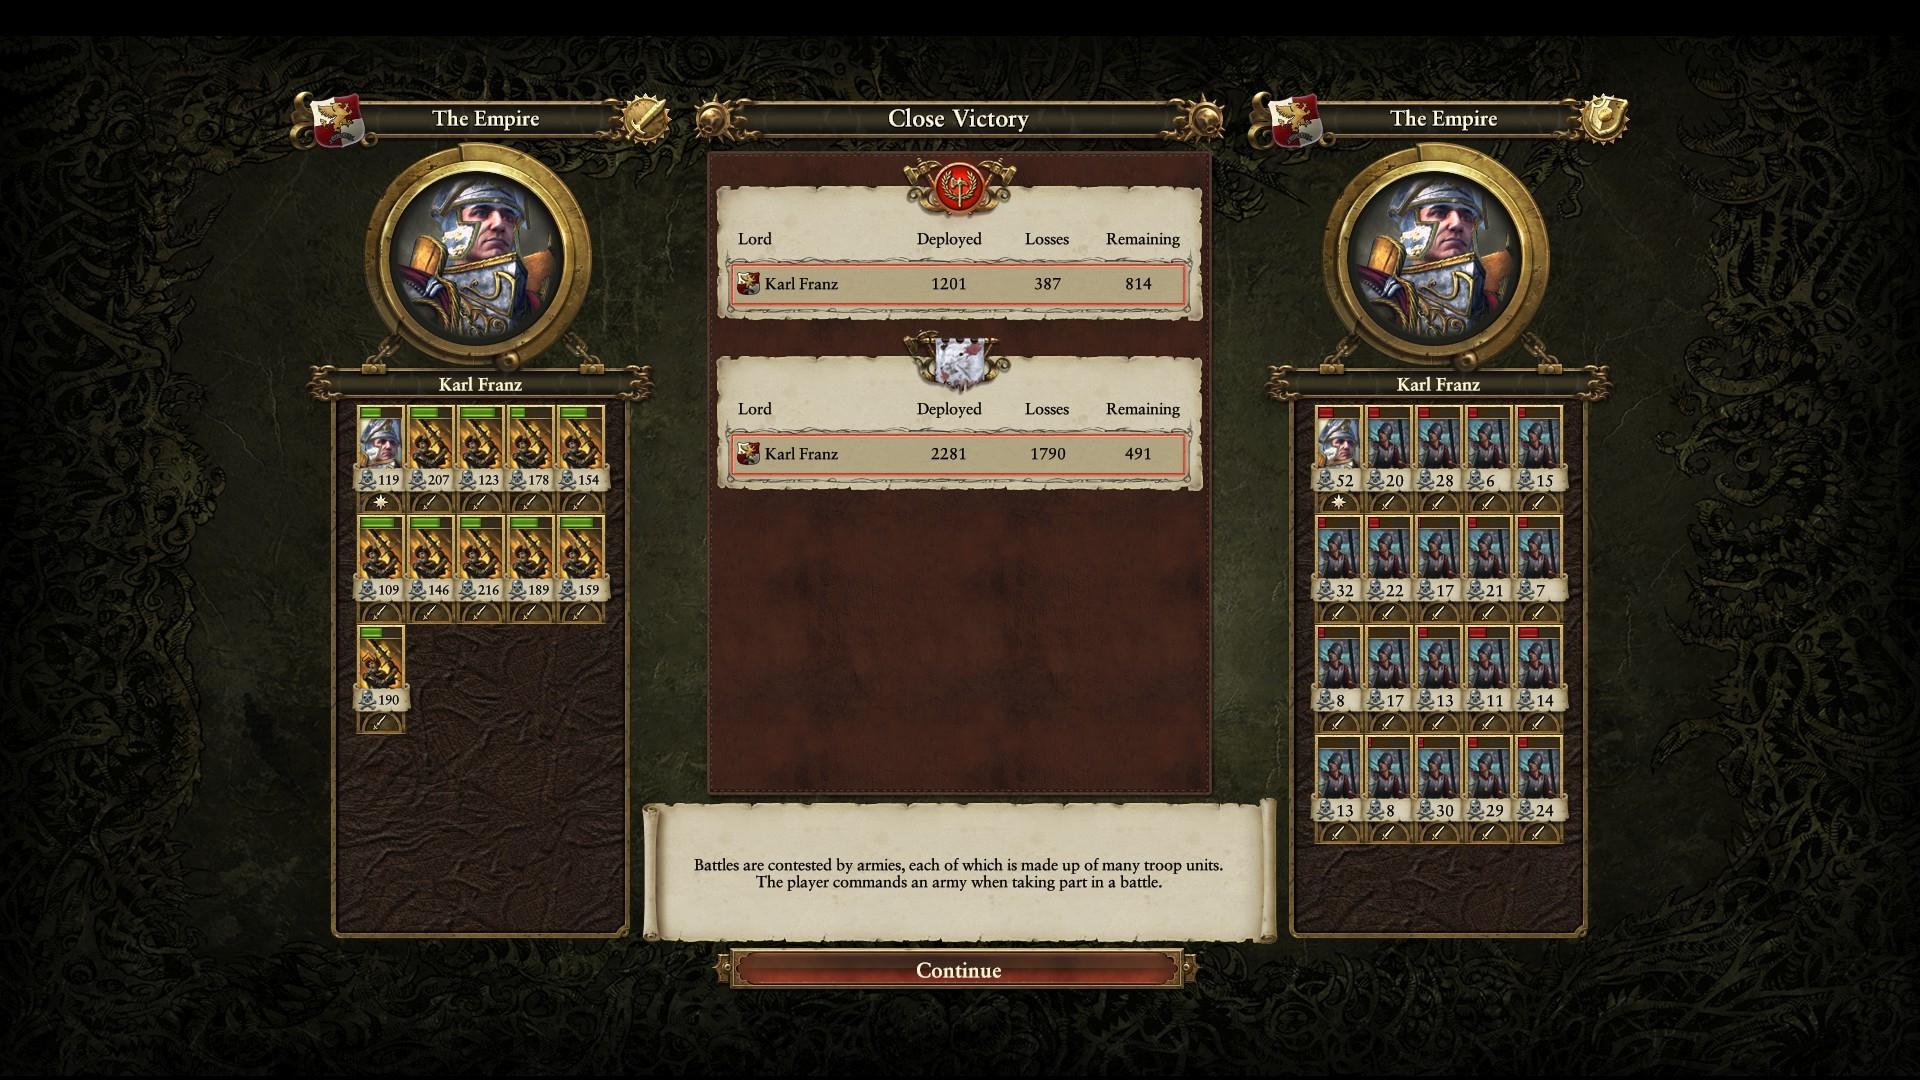 Swordsmen or Greatswords? — Total War Forums